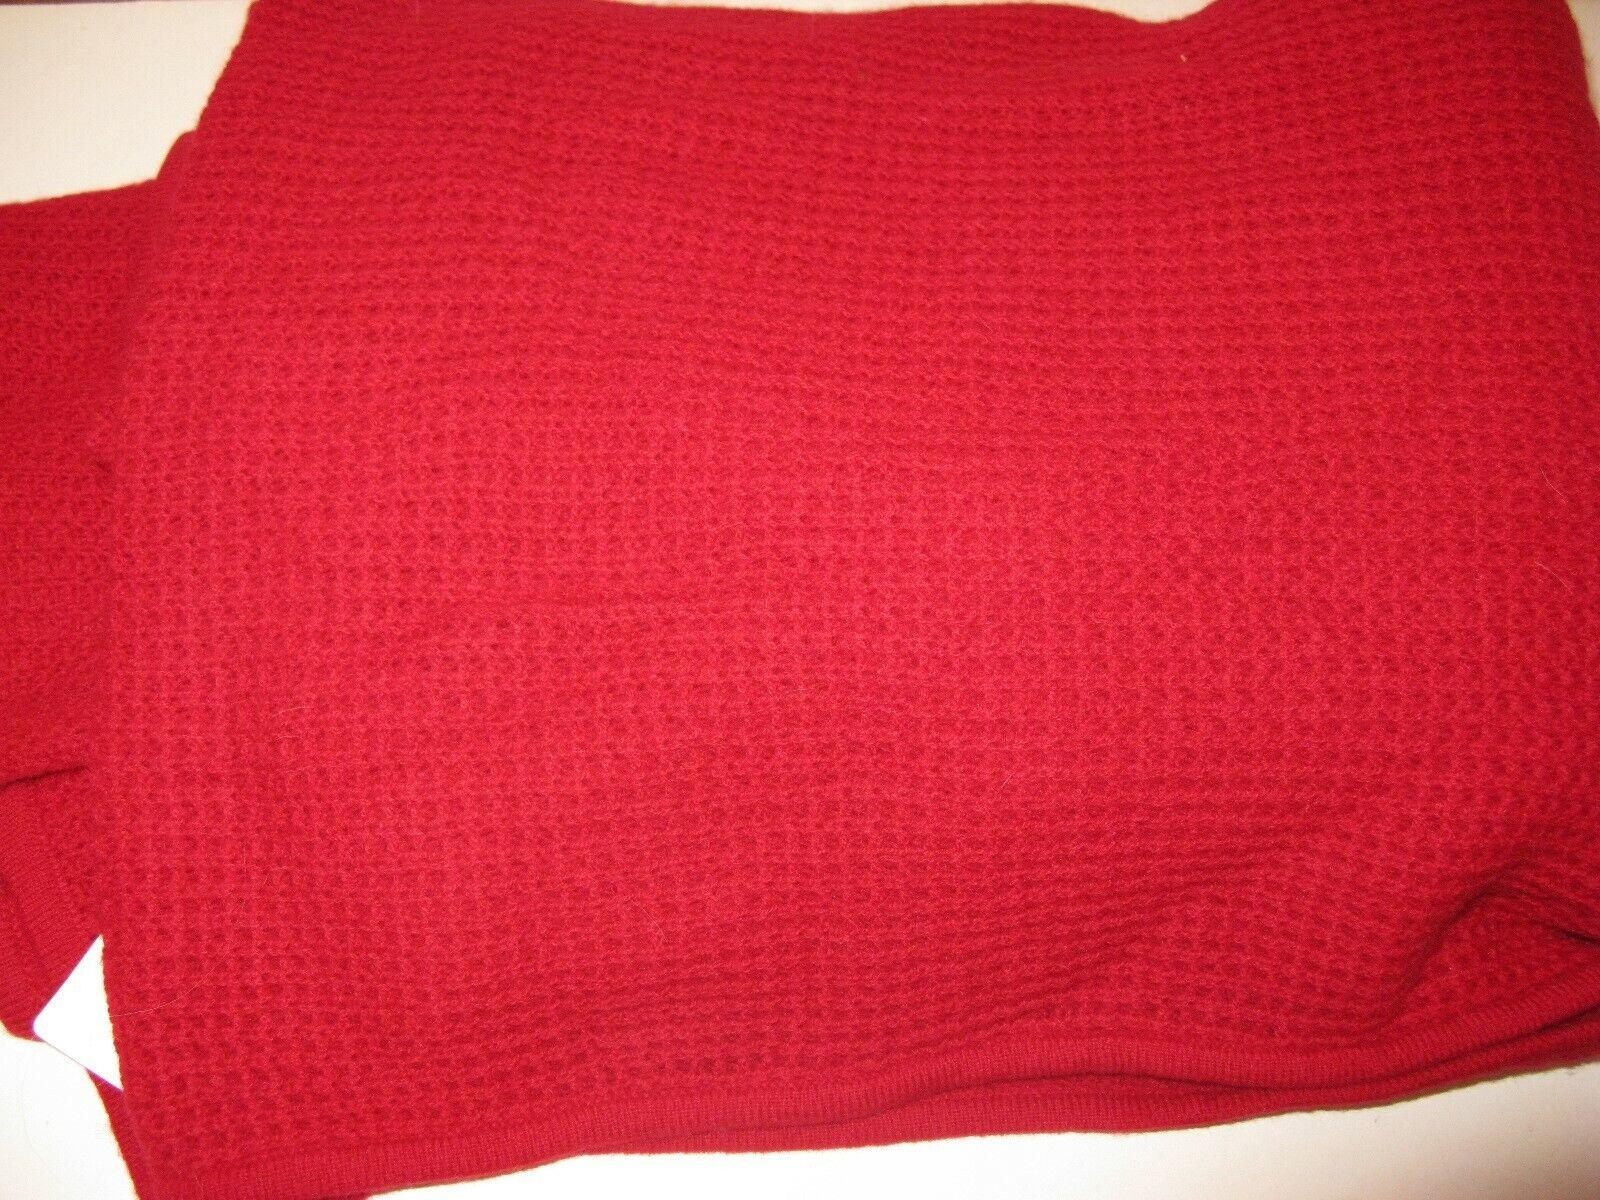 Ralph Lauren Cashmere Pique Throw Blanket RC Red  430